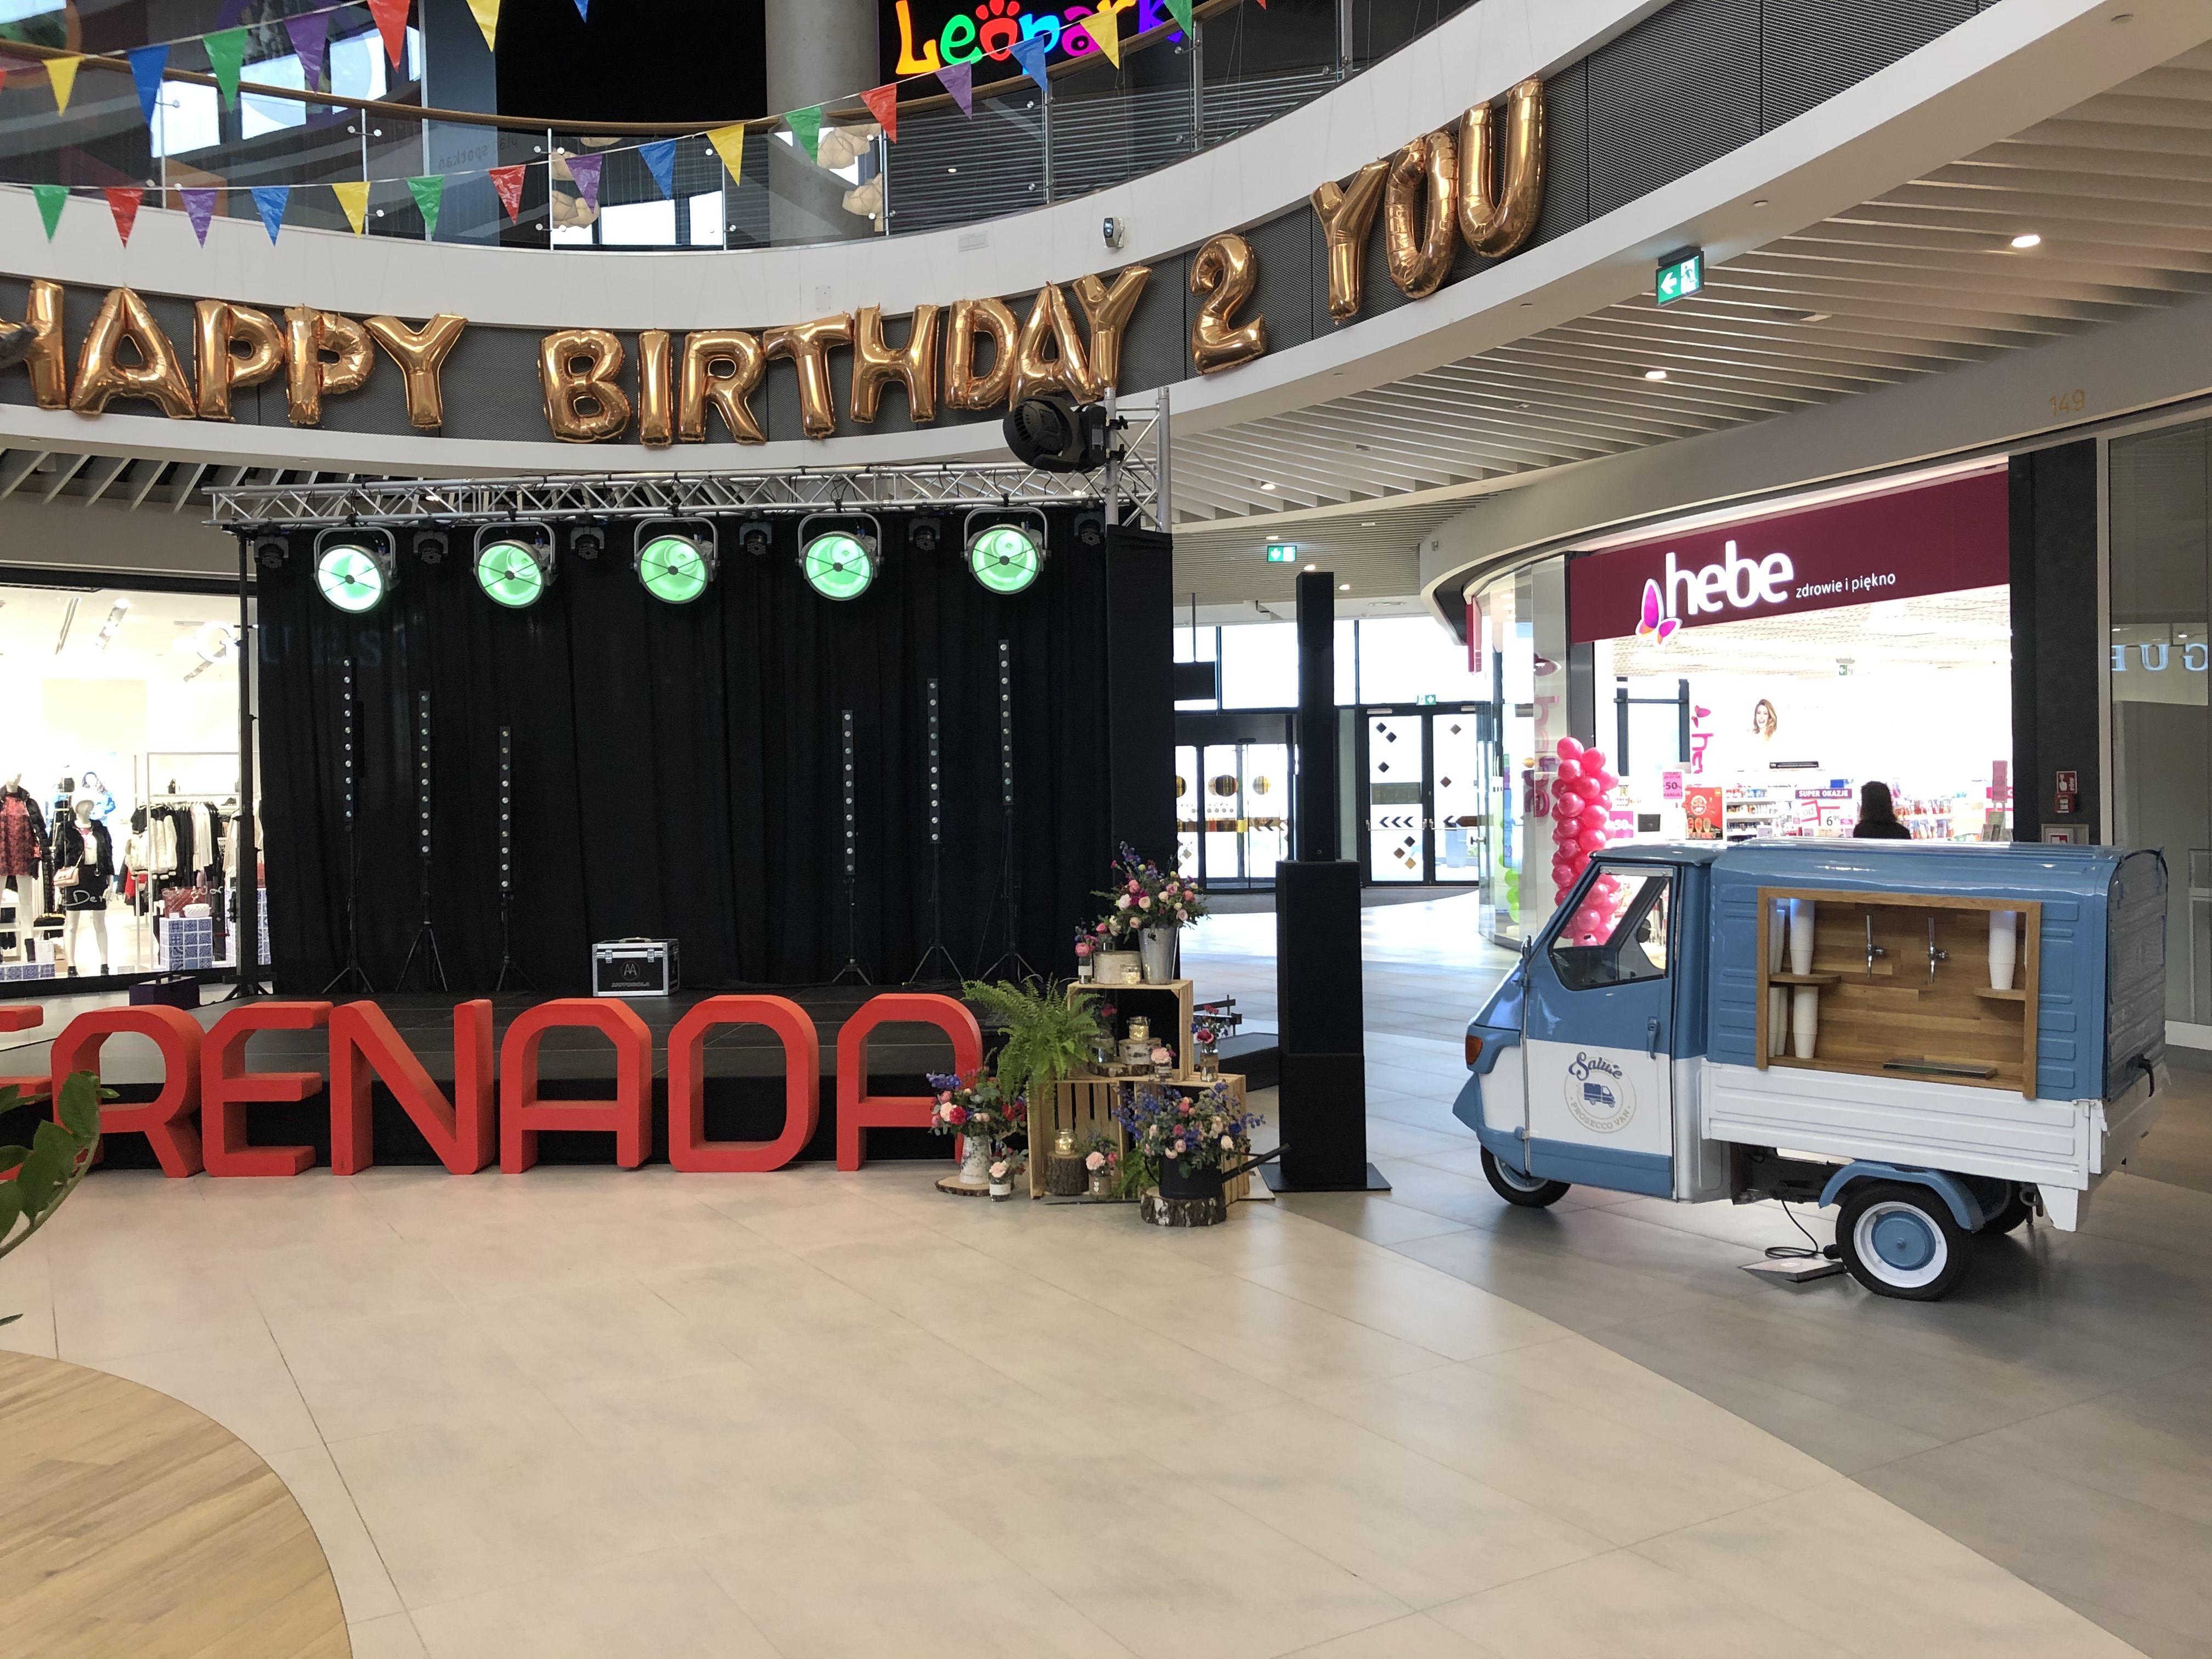 Happy Birthday 2 You Serenada